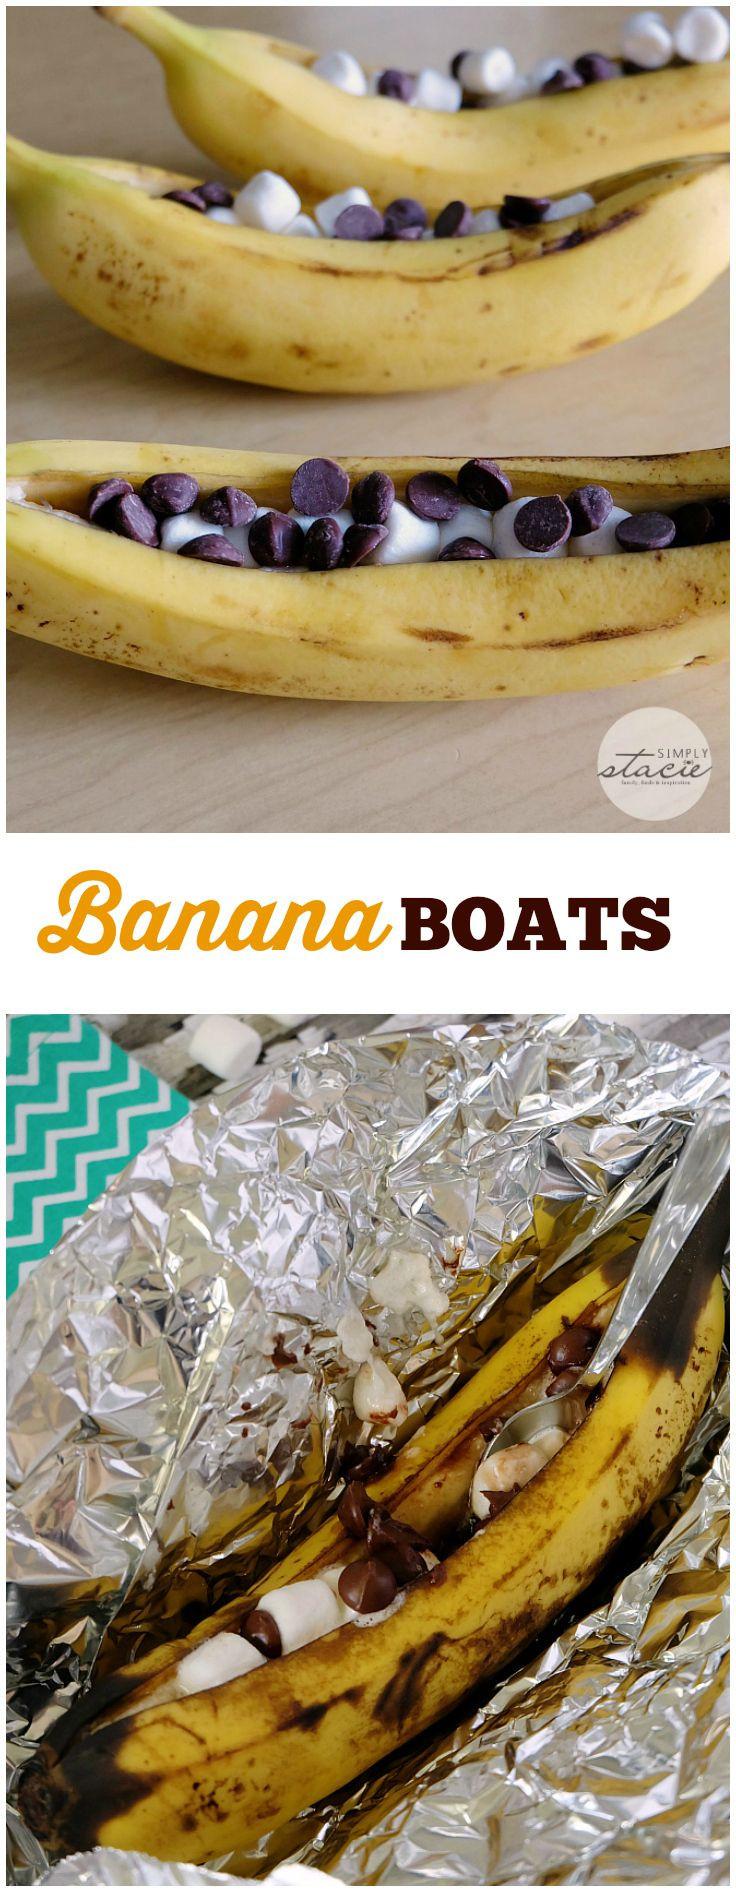 Banana Boat Dessert  17 Best ideas about Campfire Banana Boats on Pinterest